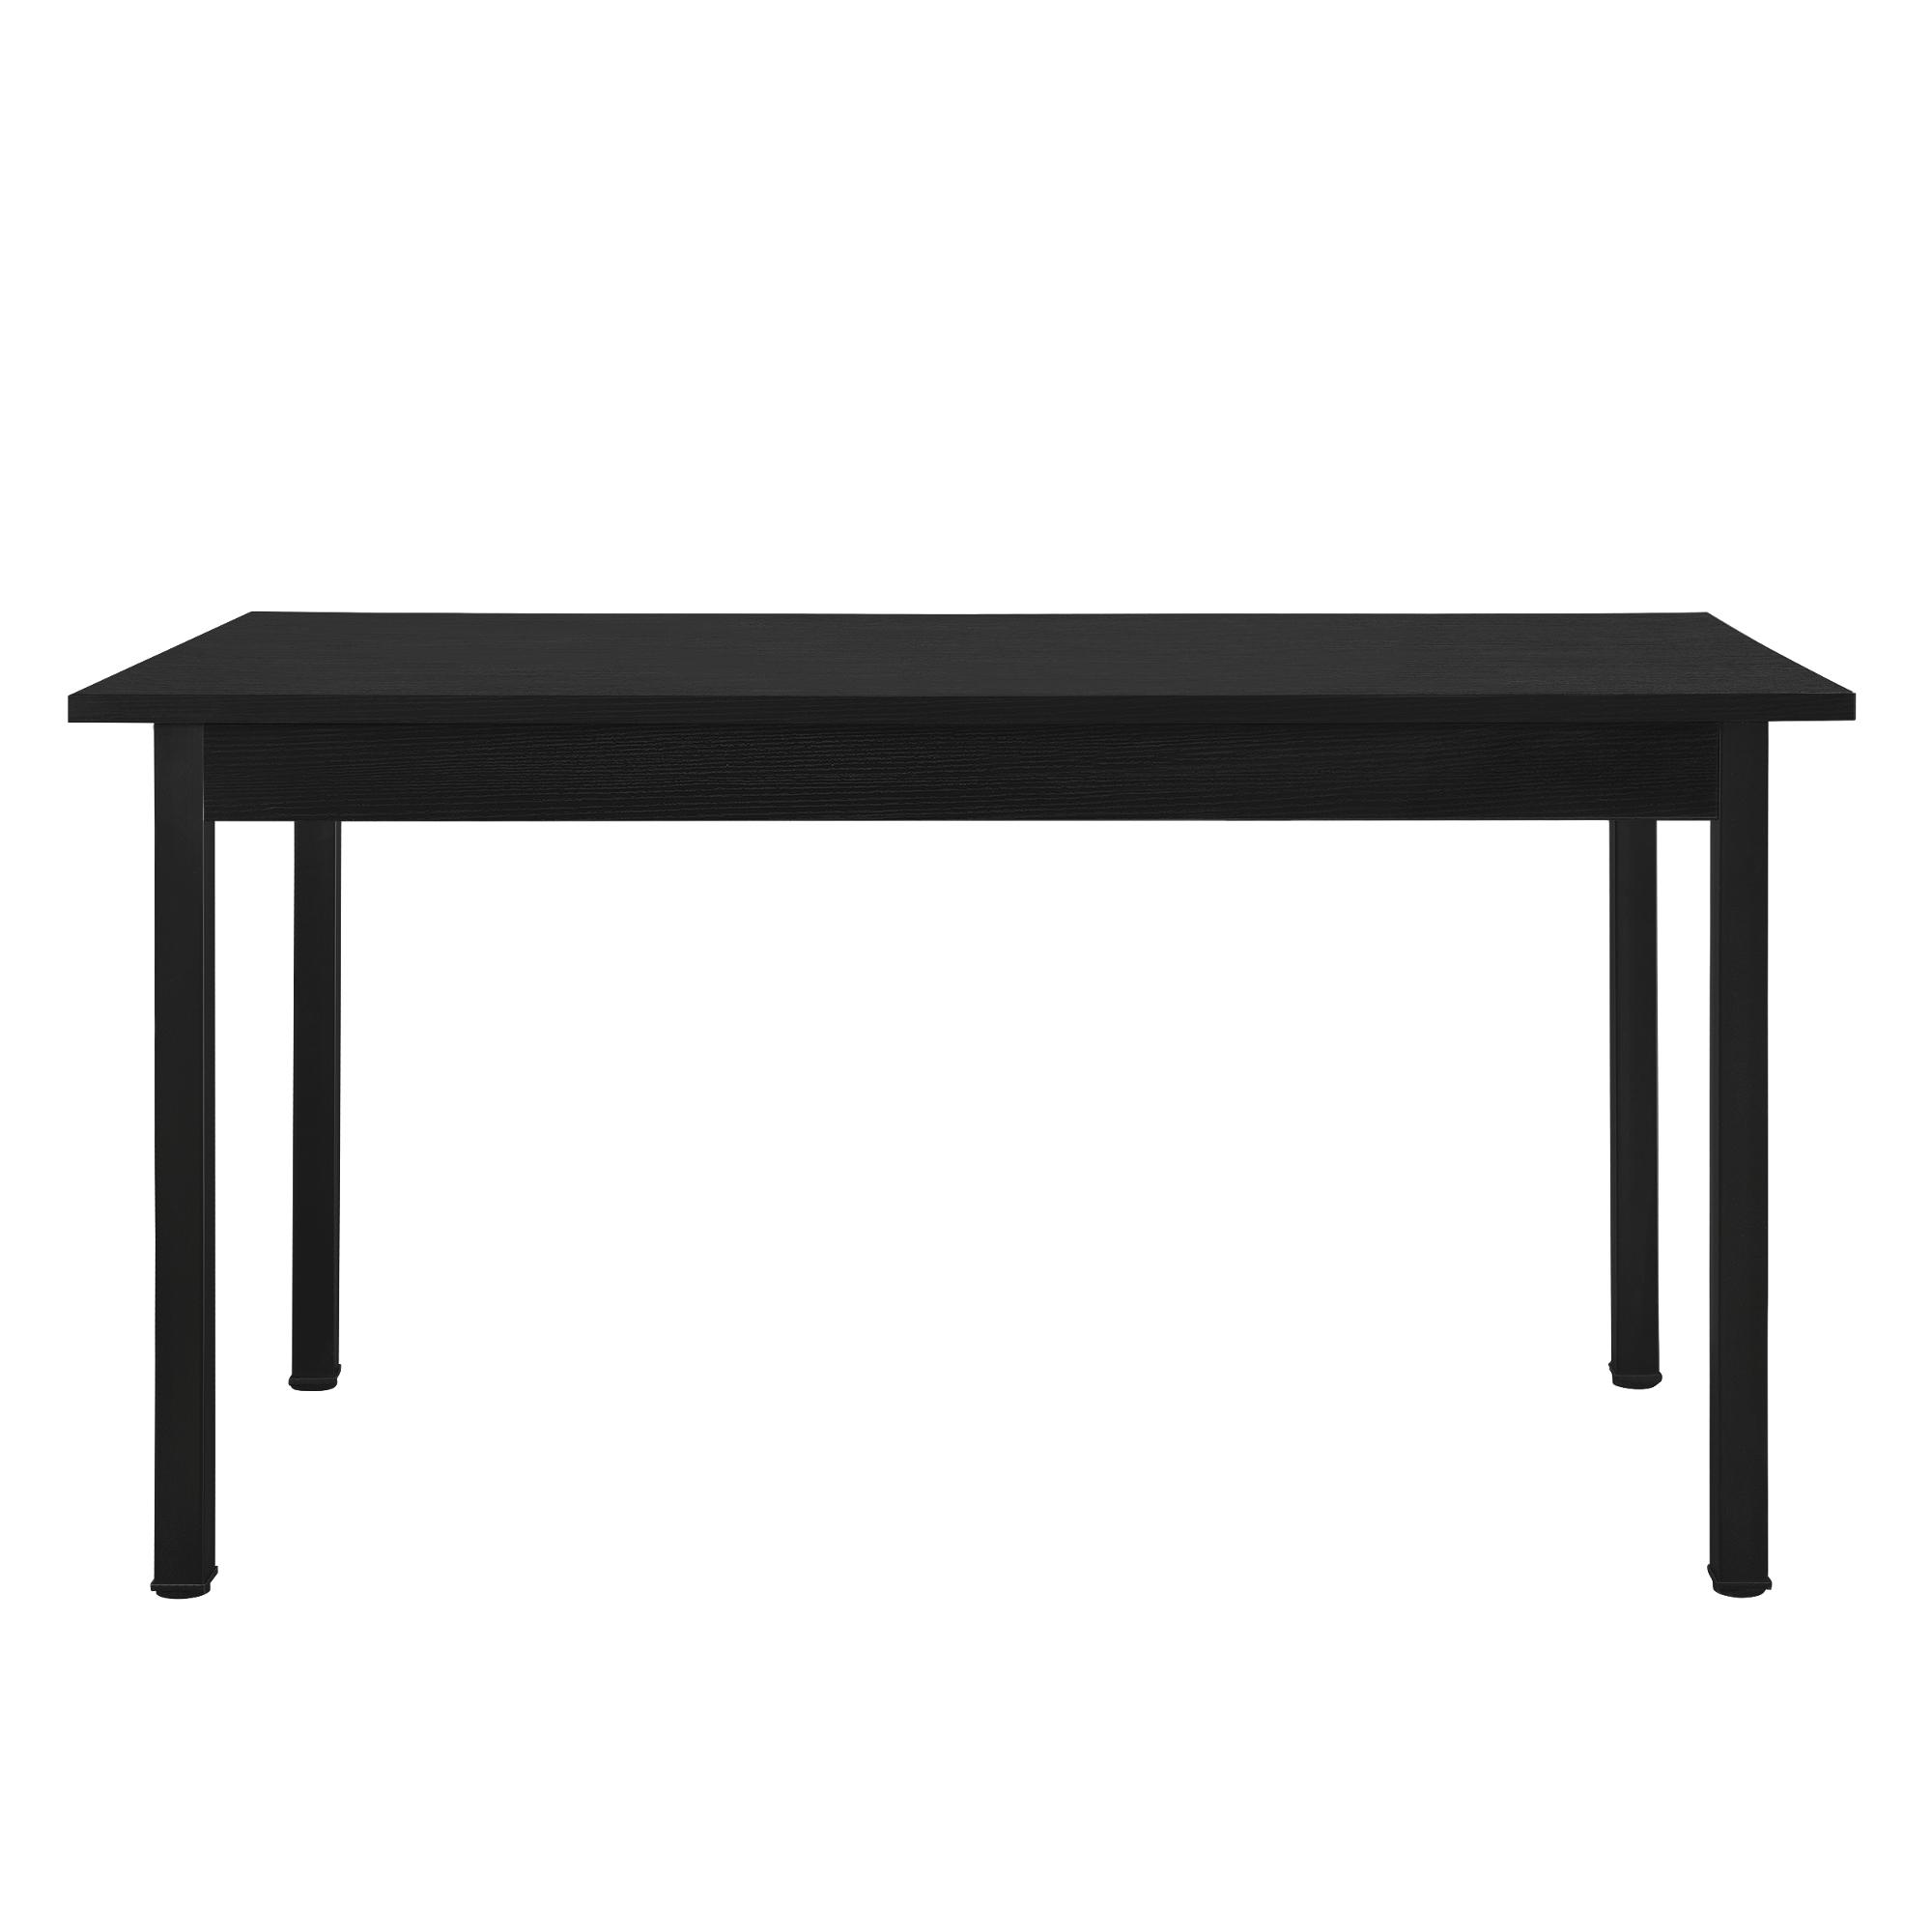 American Made Pedestal Dining Tables Images Shop Our Huge  : EsstischHTBT 4714front from favefaves.com size 2000 x 2000 jpeg 378kB